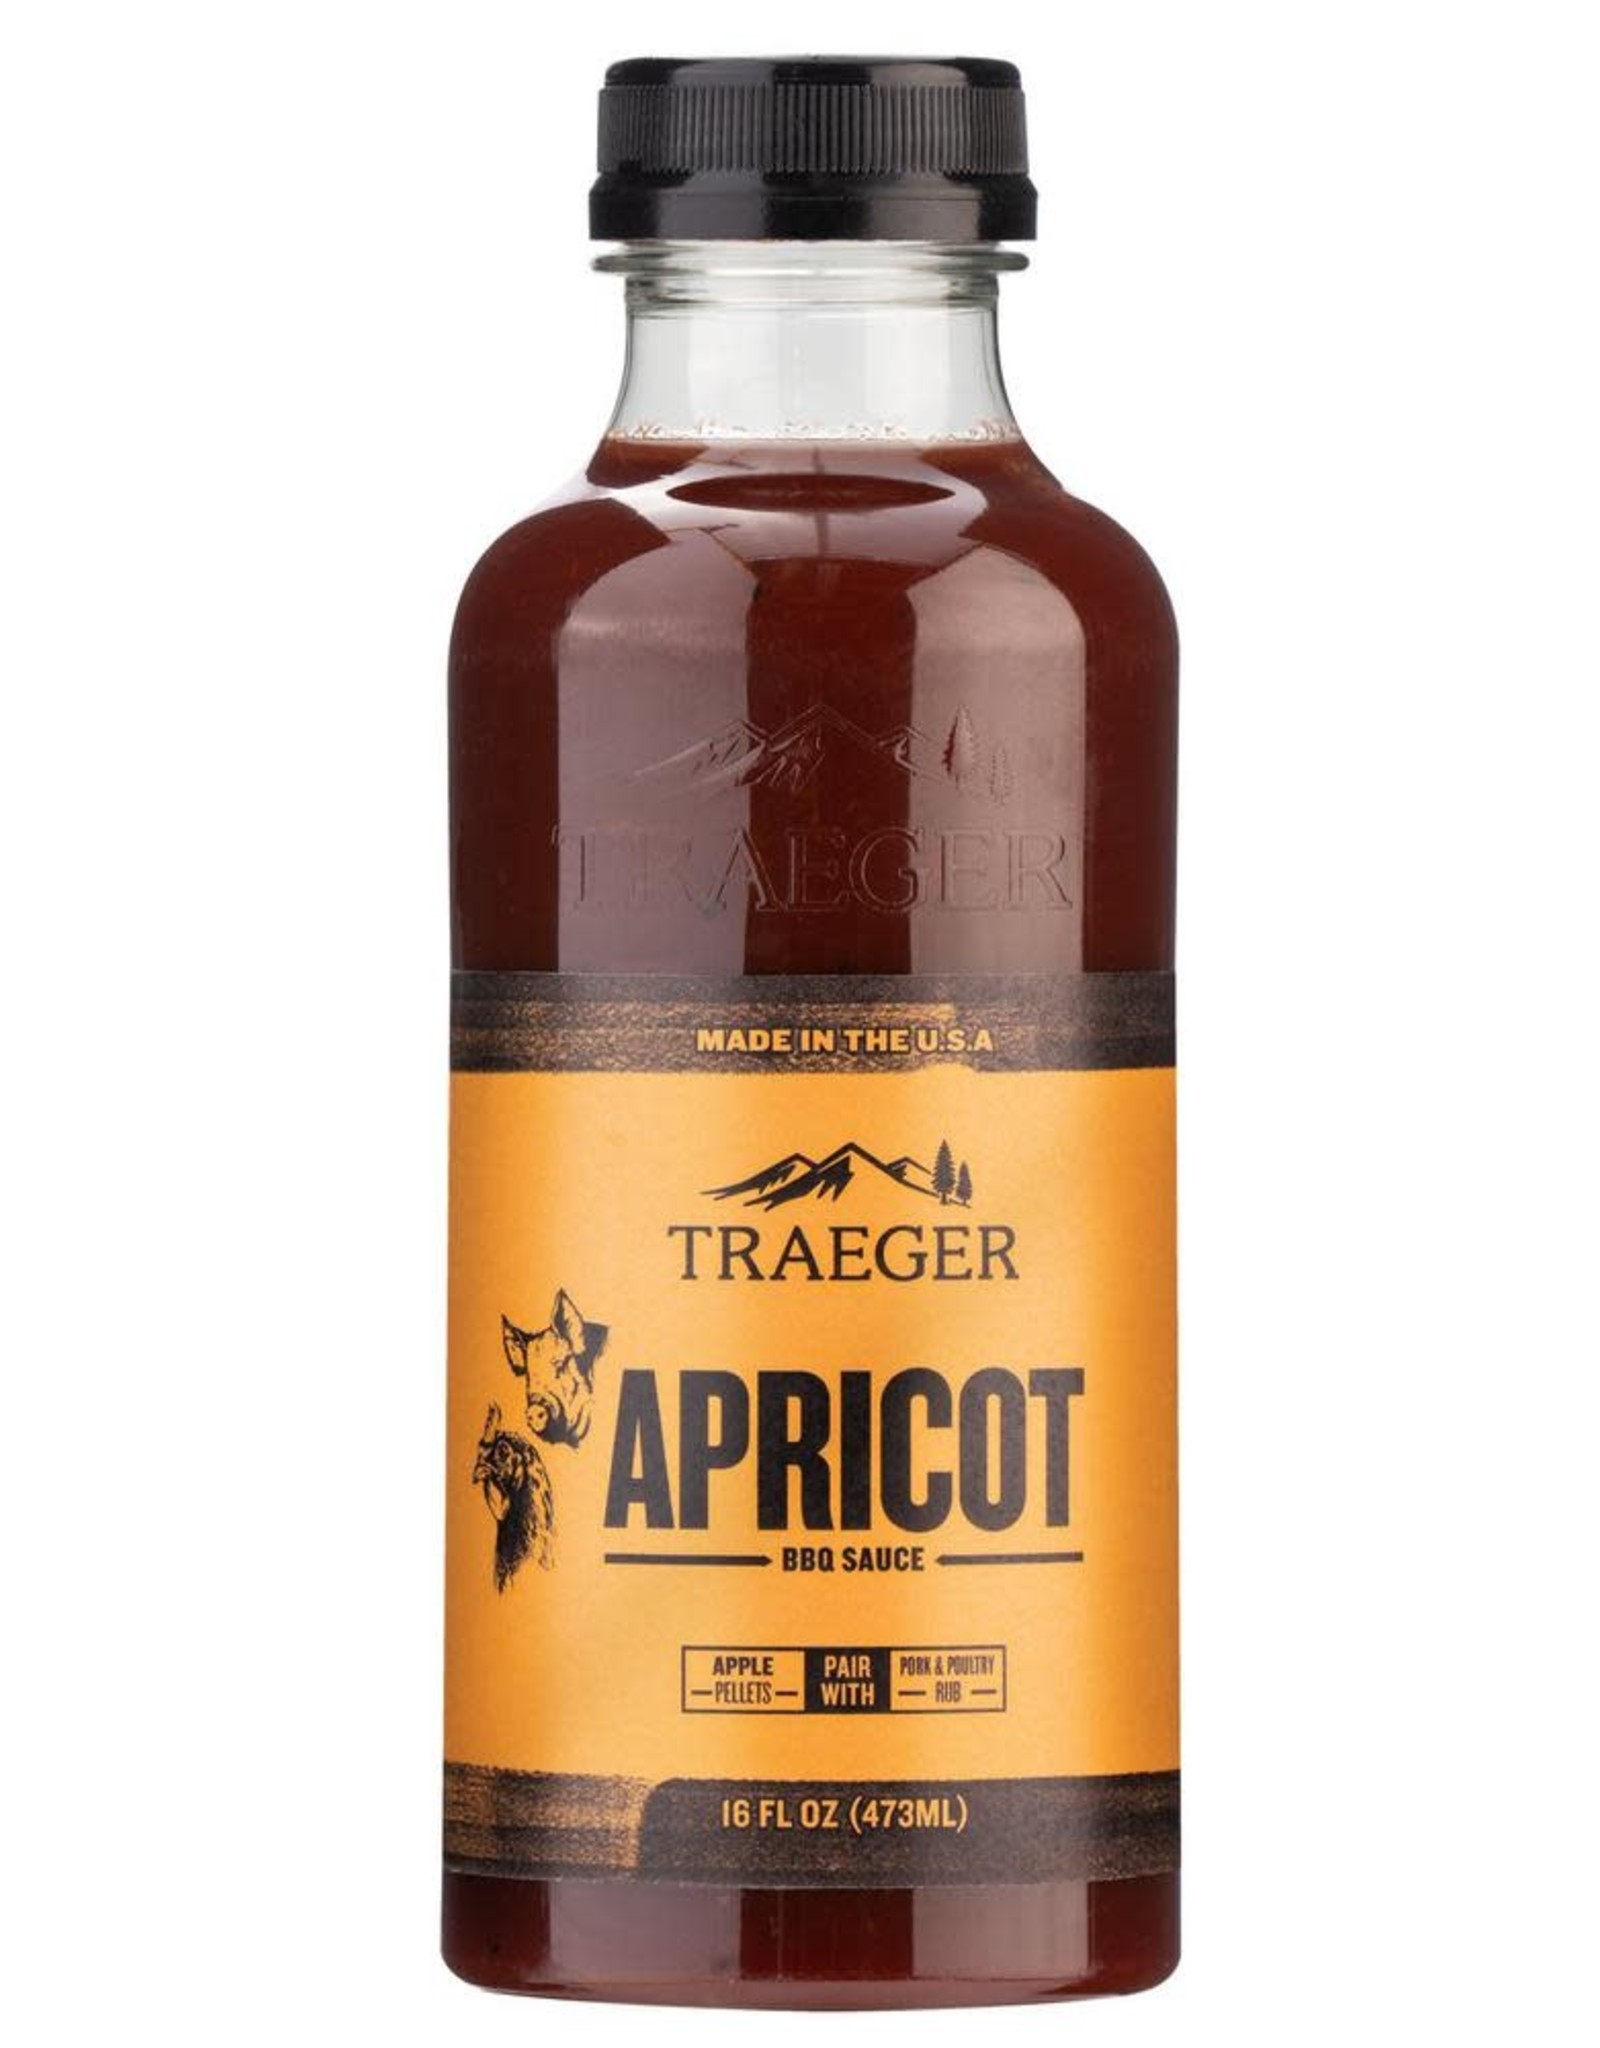 Traeger Traeger Apricot BBQ Sauce - SAU036